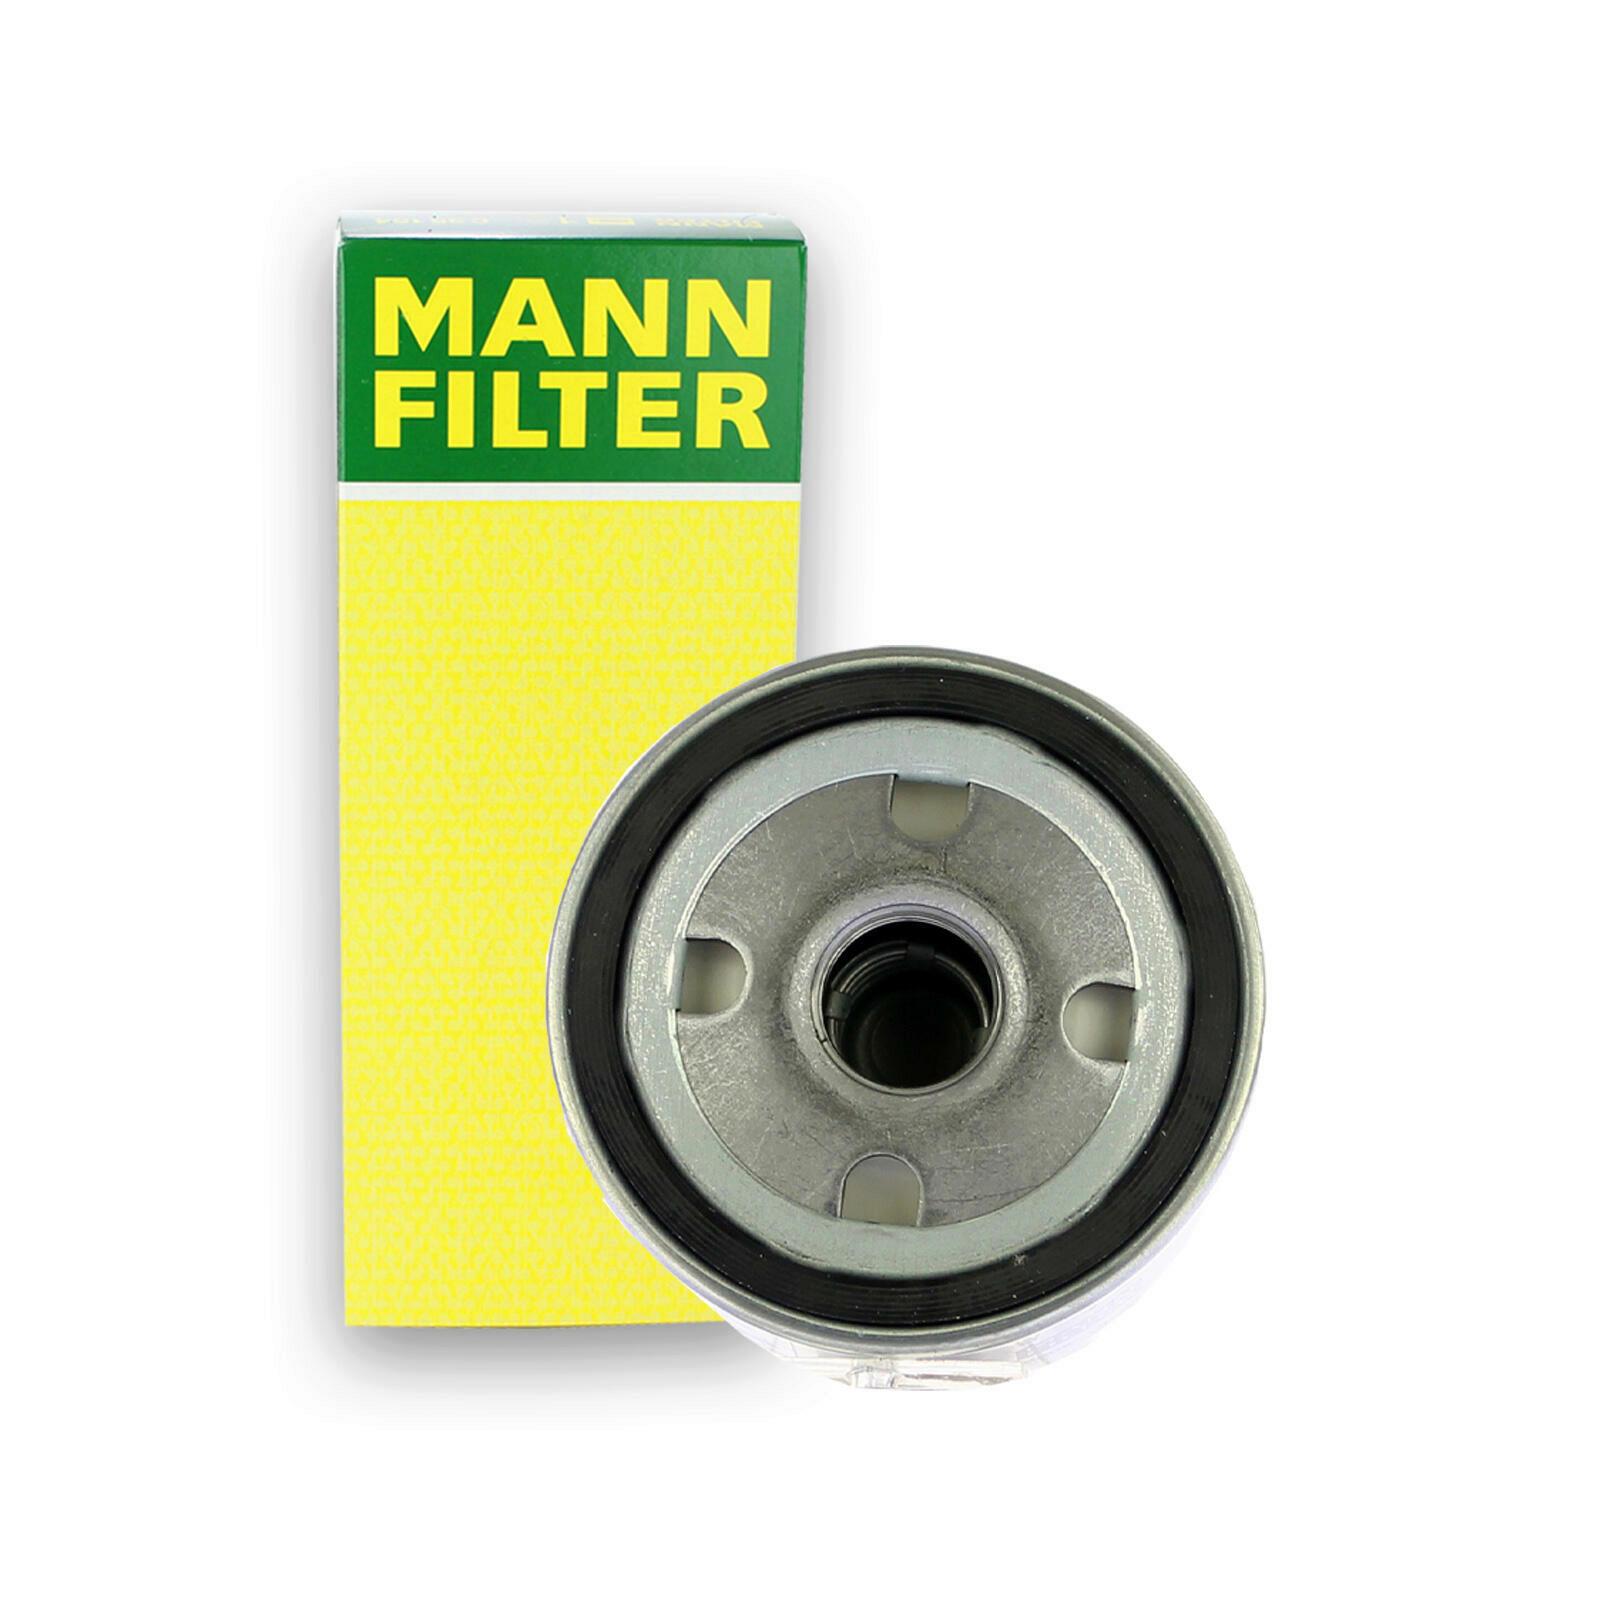 Mannol Inspektionskit Motoröl + MANN Ölfilter + Ablassschraube